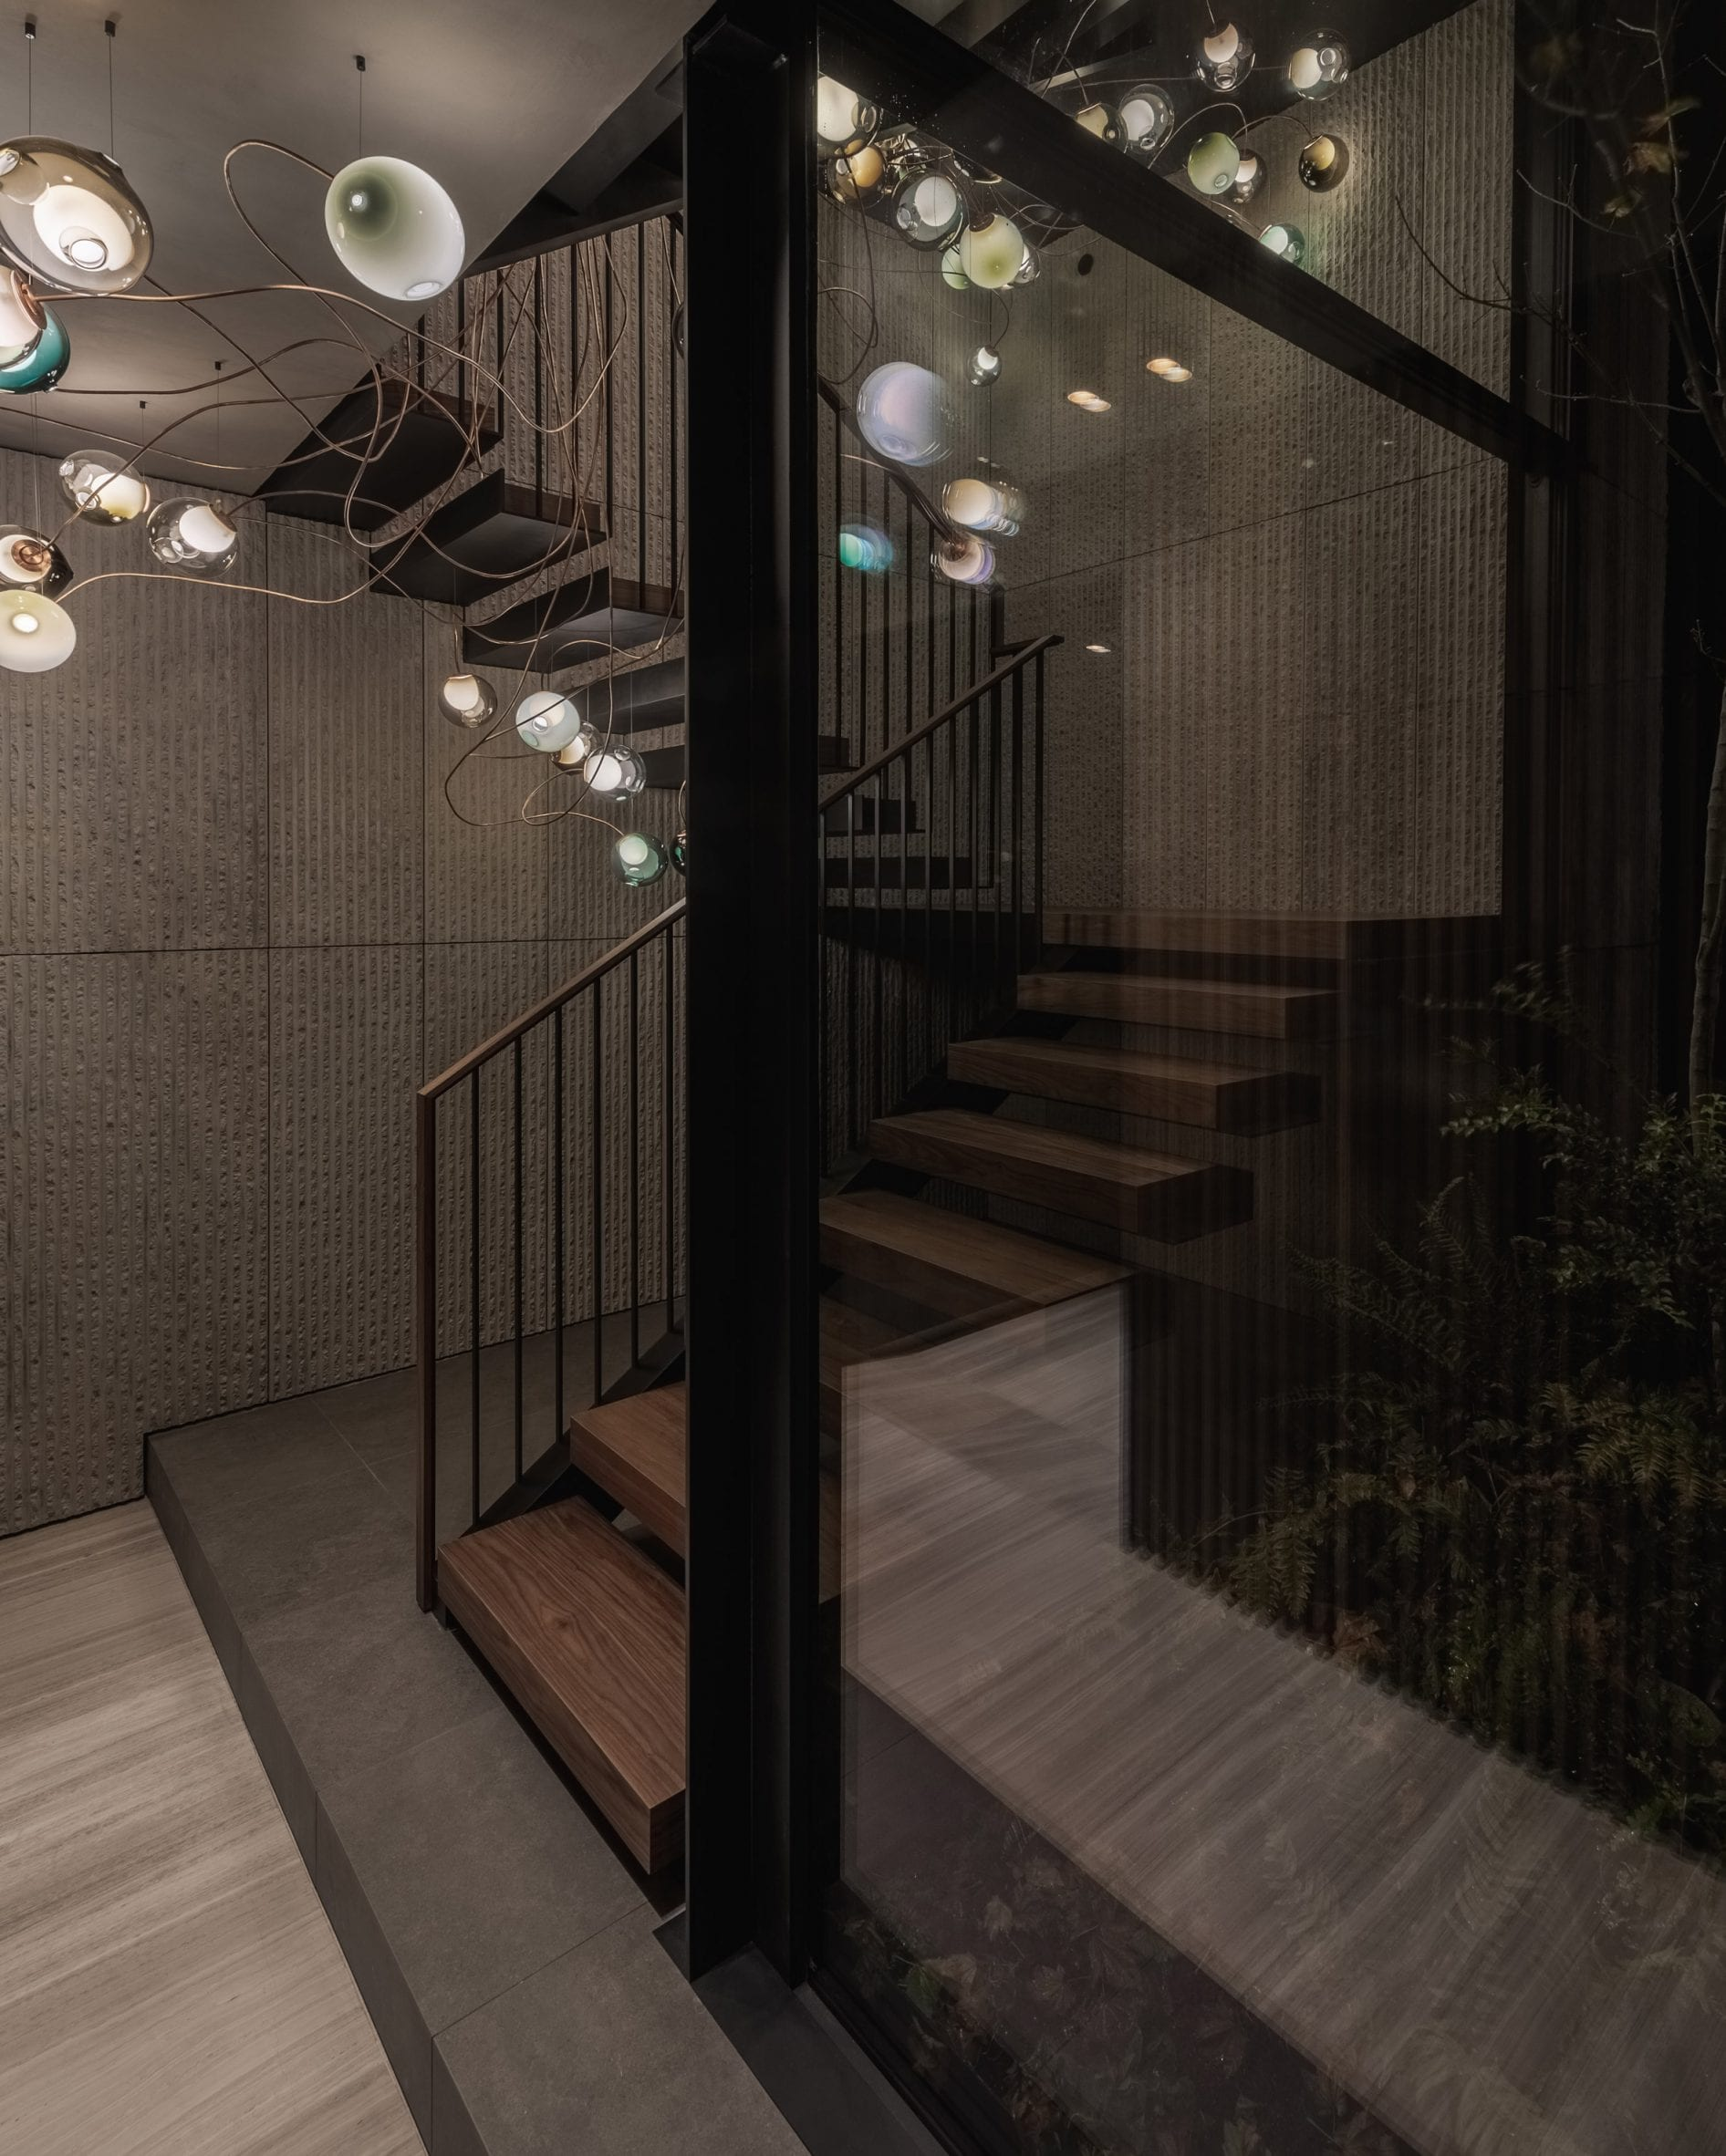 leckie-studio-penthouse-big-skyscraper-vancouver_dezeen_2364_col_9-scaled.jpg